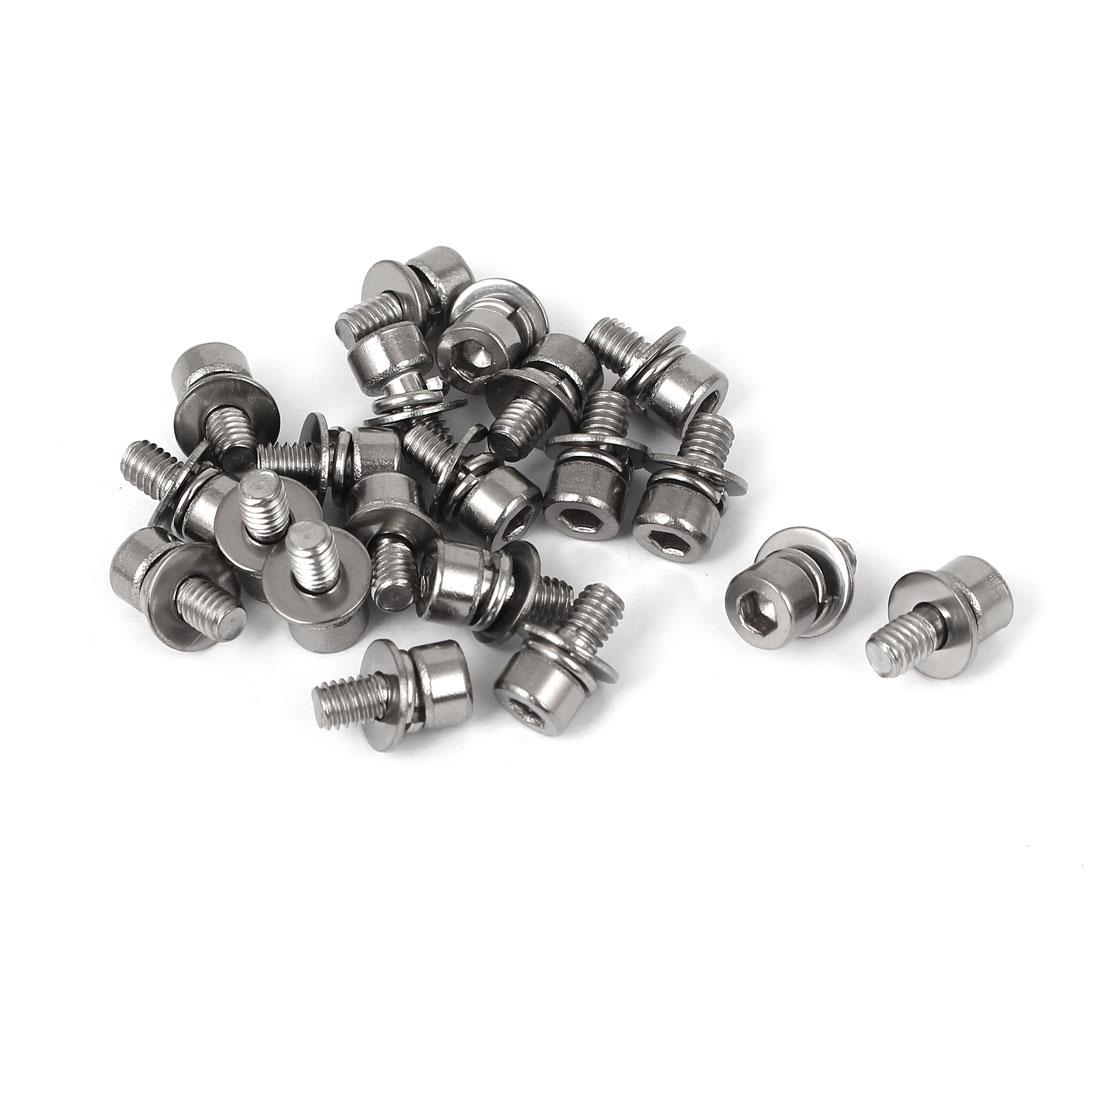 M4 x 8mm Thread 304 Stainless Steel Hex Socket Head Cap Screw w Washer 20 Pcs